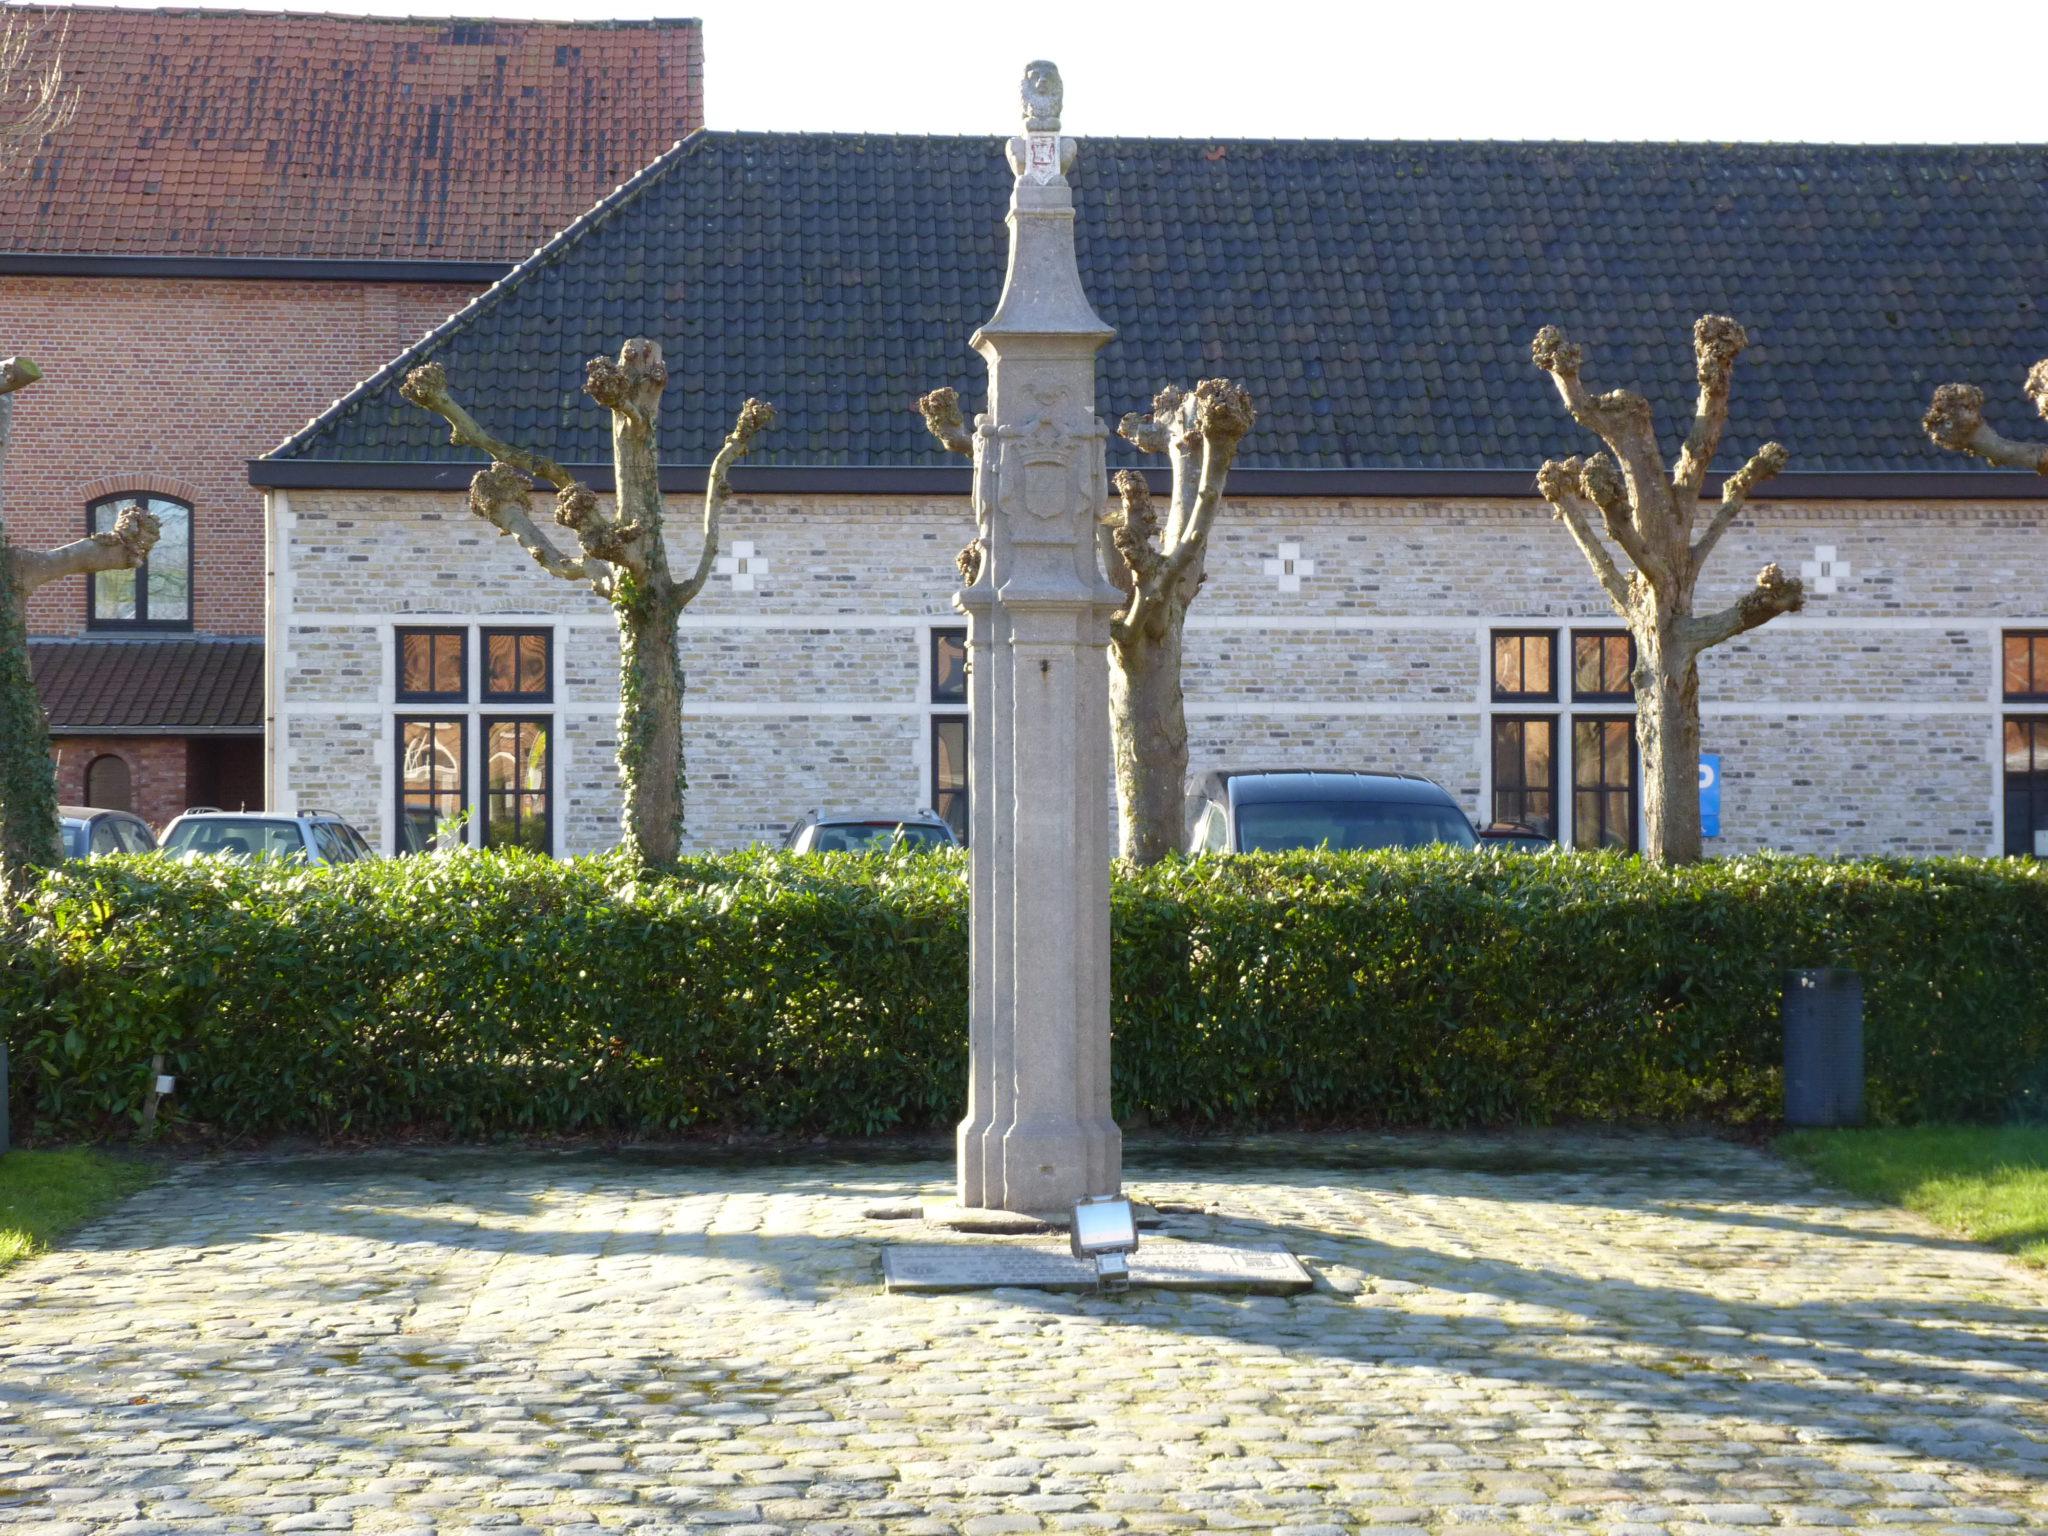 Bladelin wandelroute Middelburg.